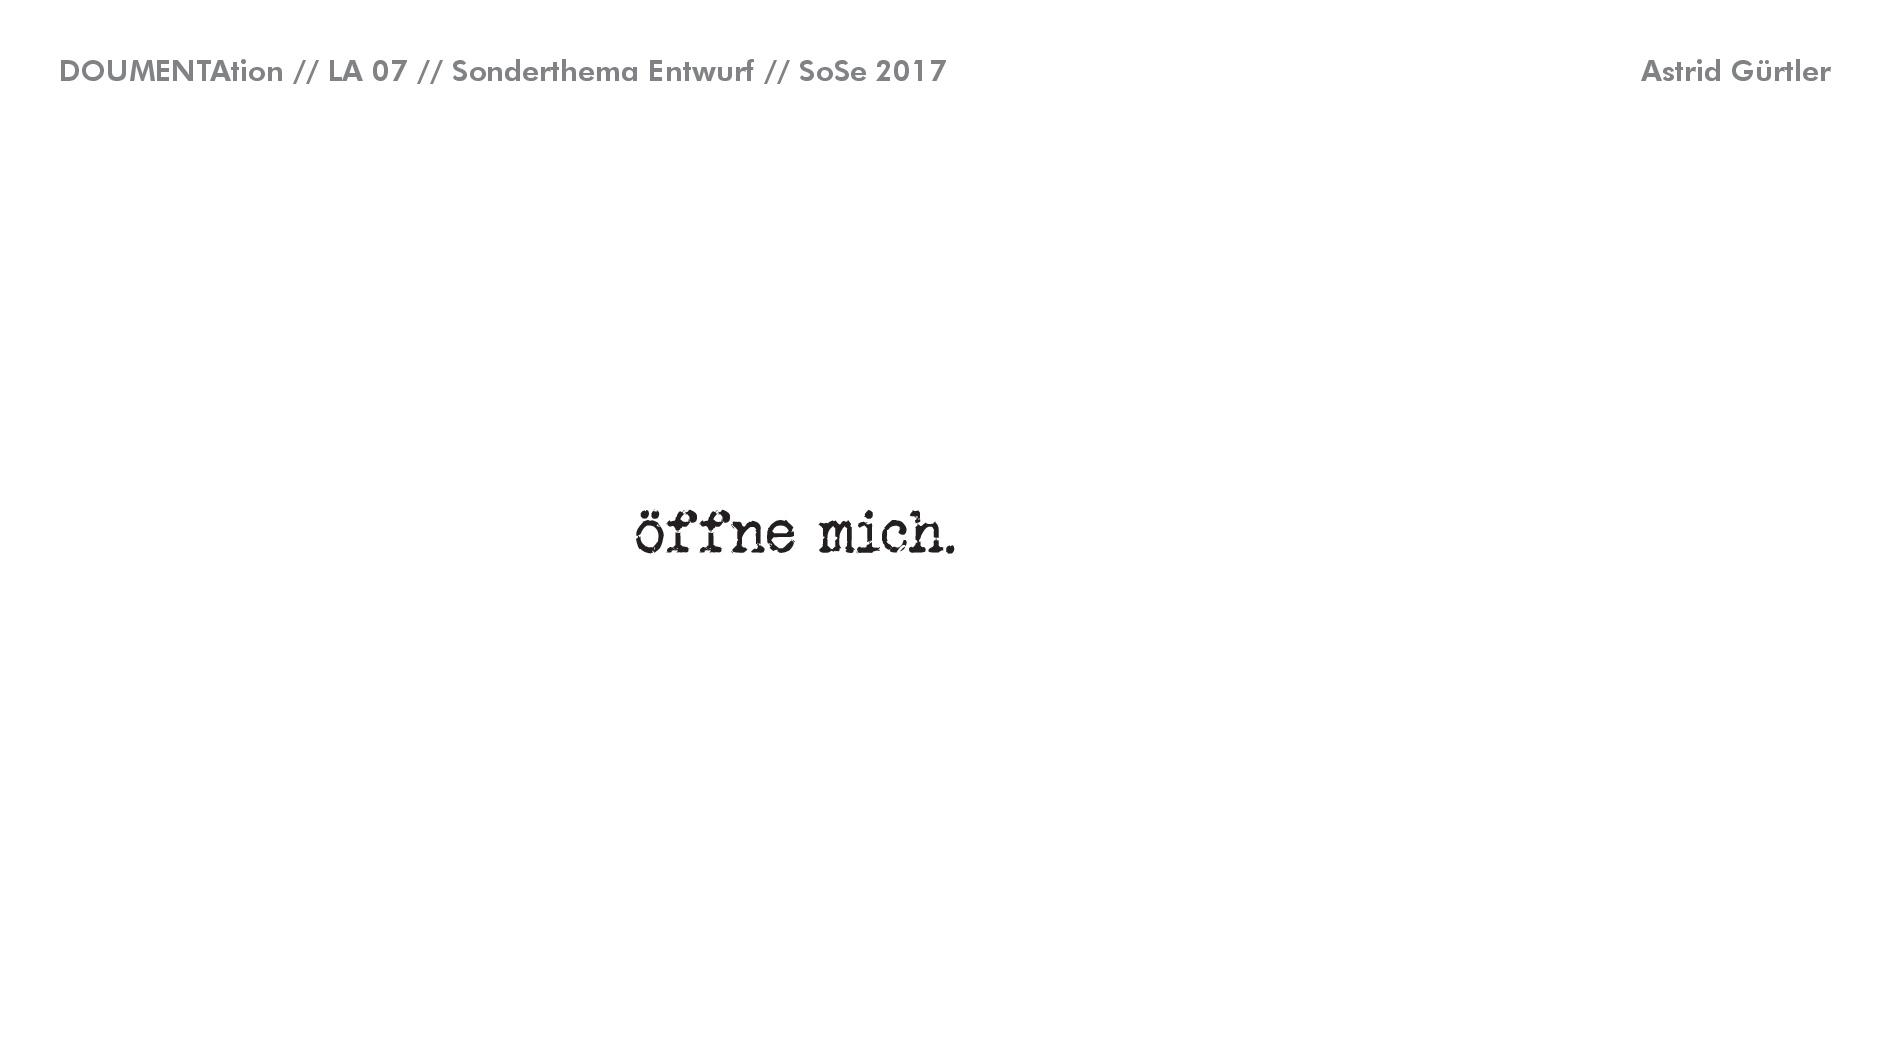 NEU Sonderthema Entwerfen SoSe 17 023